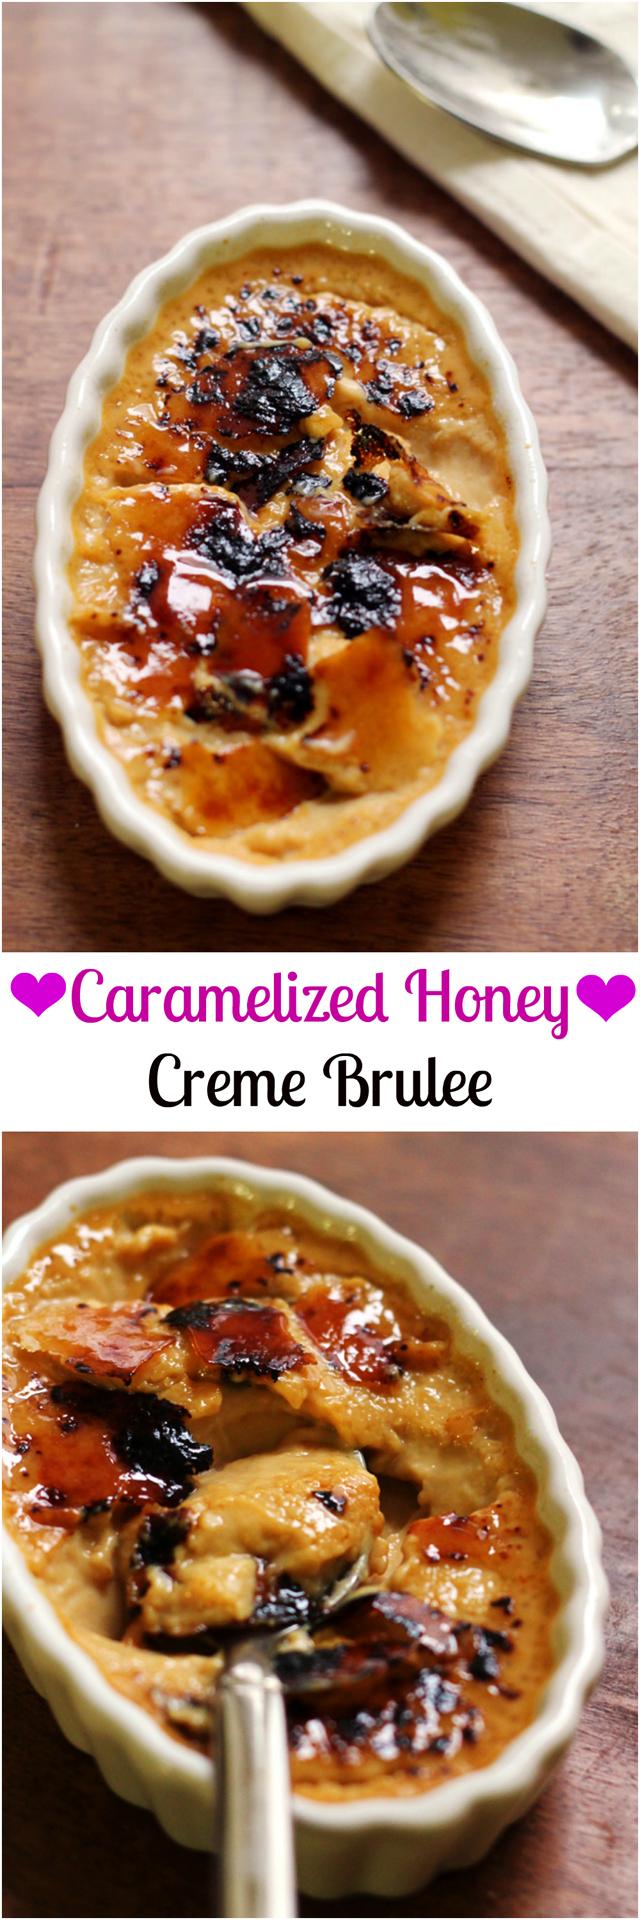 caramelized honey creme brulee